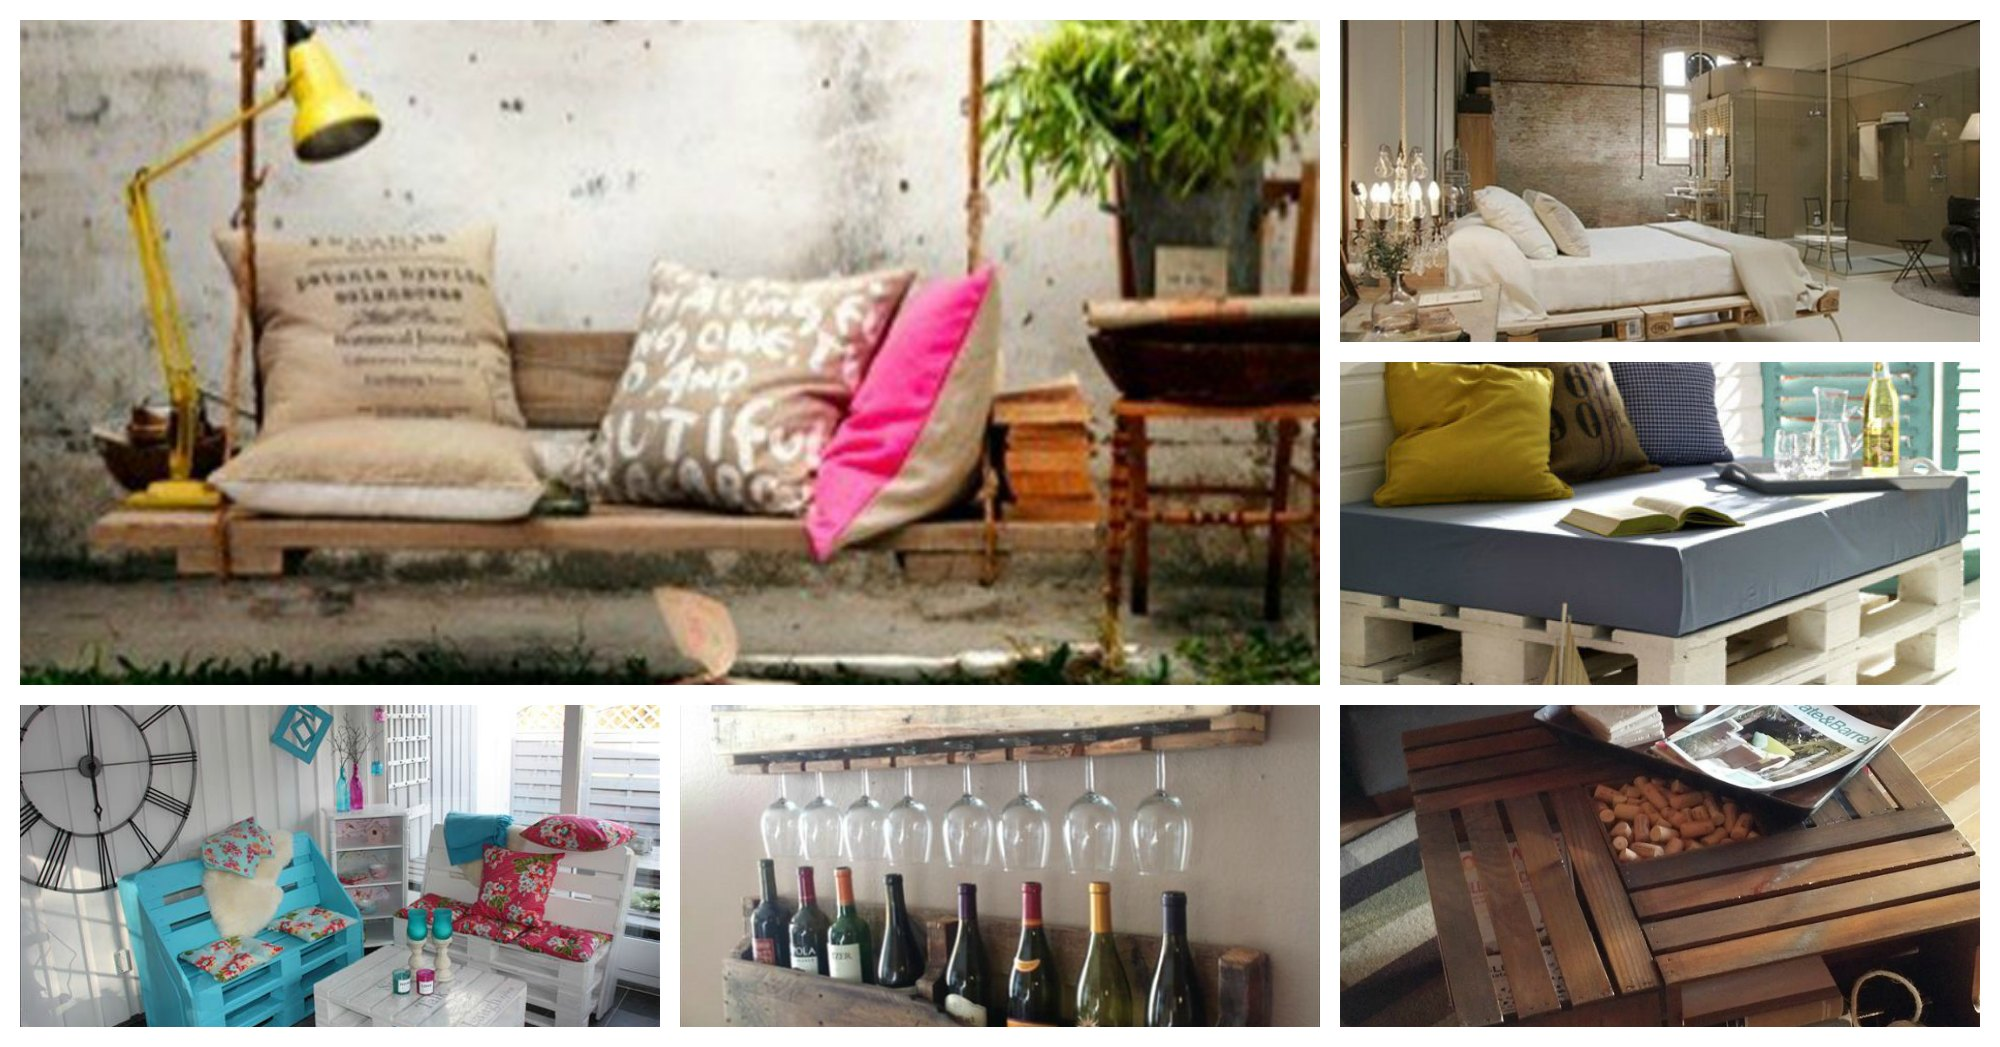 20 ideas creativas para reciclar palets de madera - Como reciclar palets ...